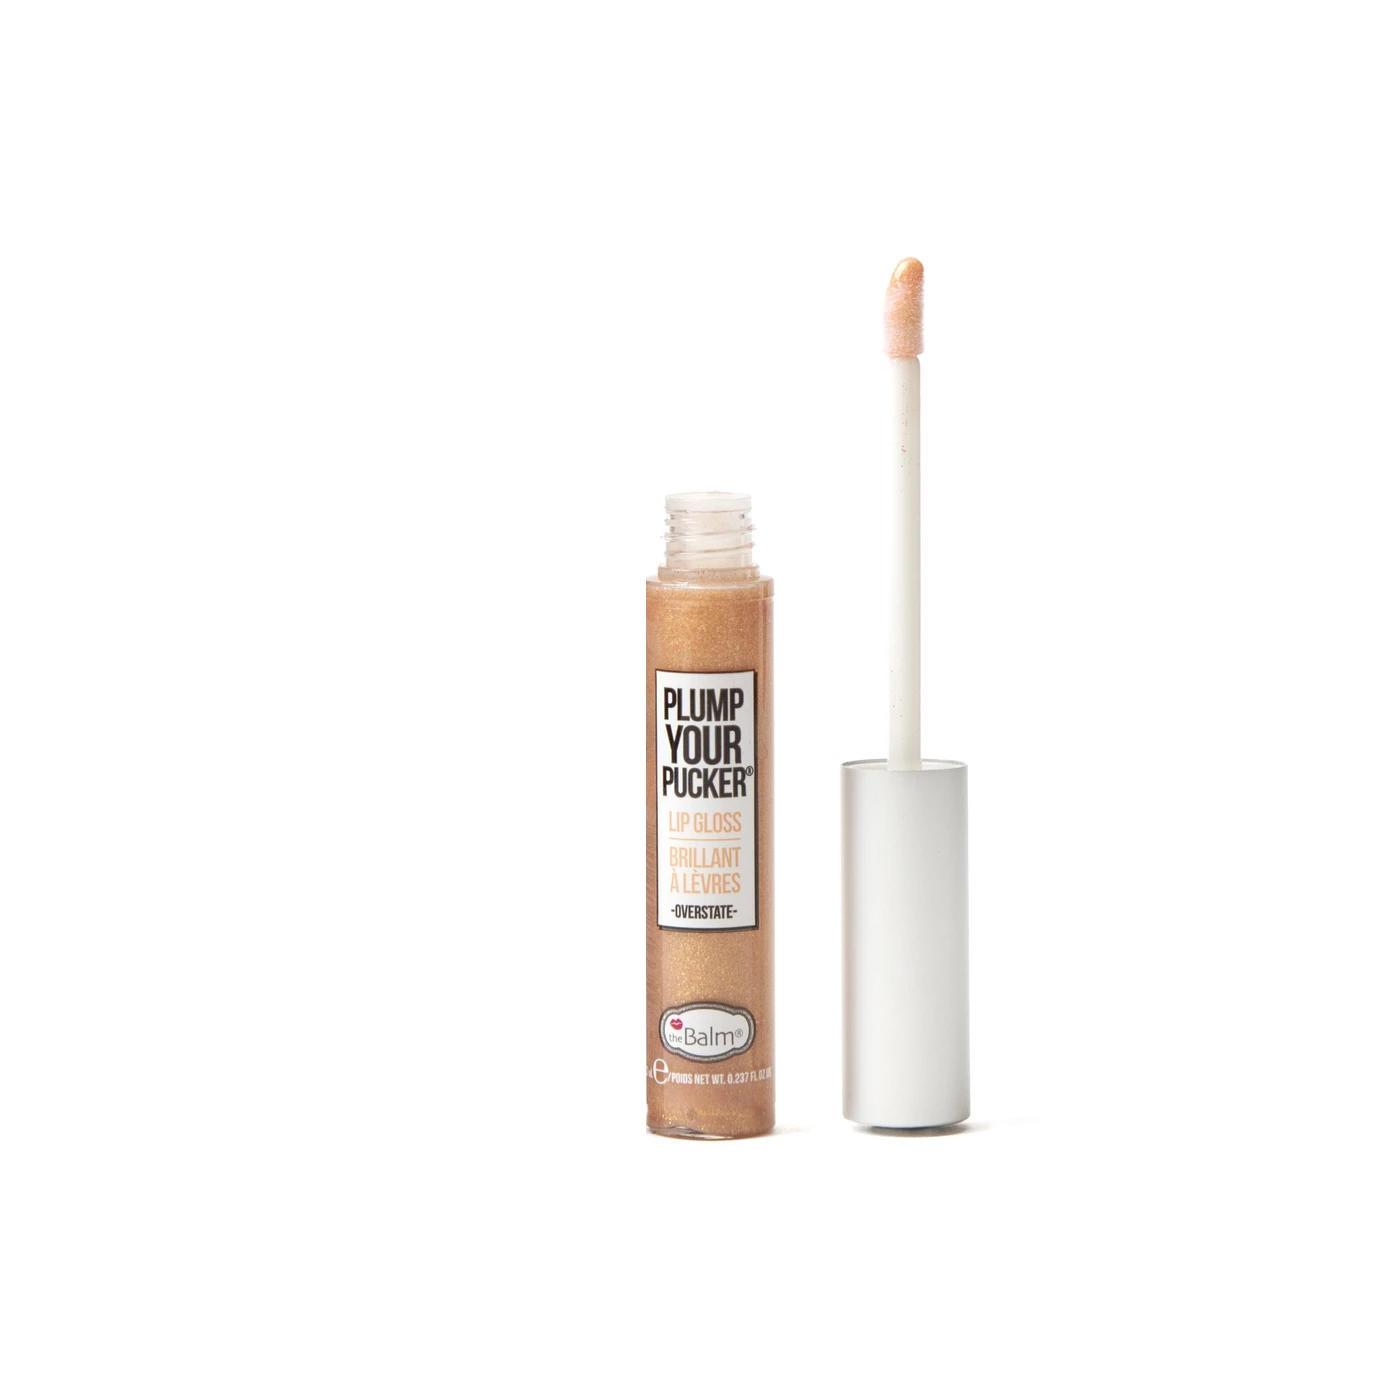 The Balm Plump Your Pucker Lip Gloss Overstate Mini